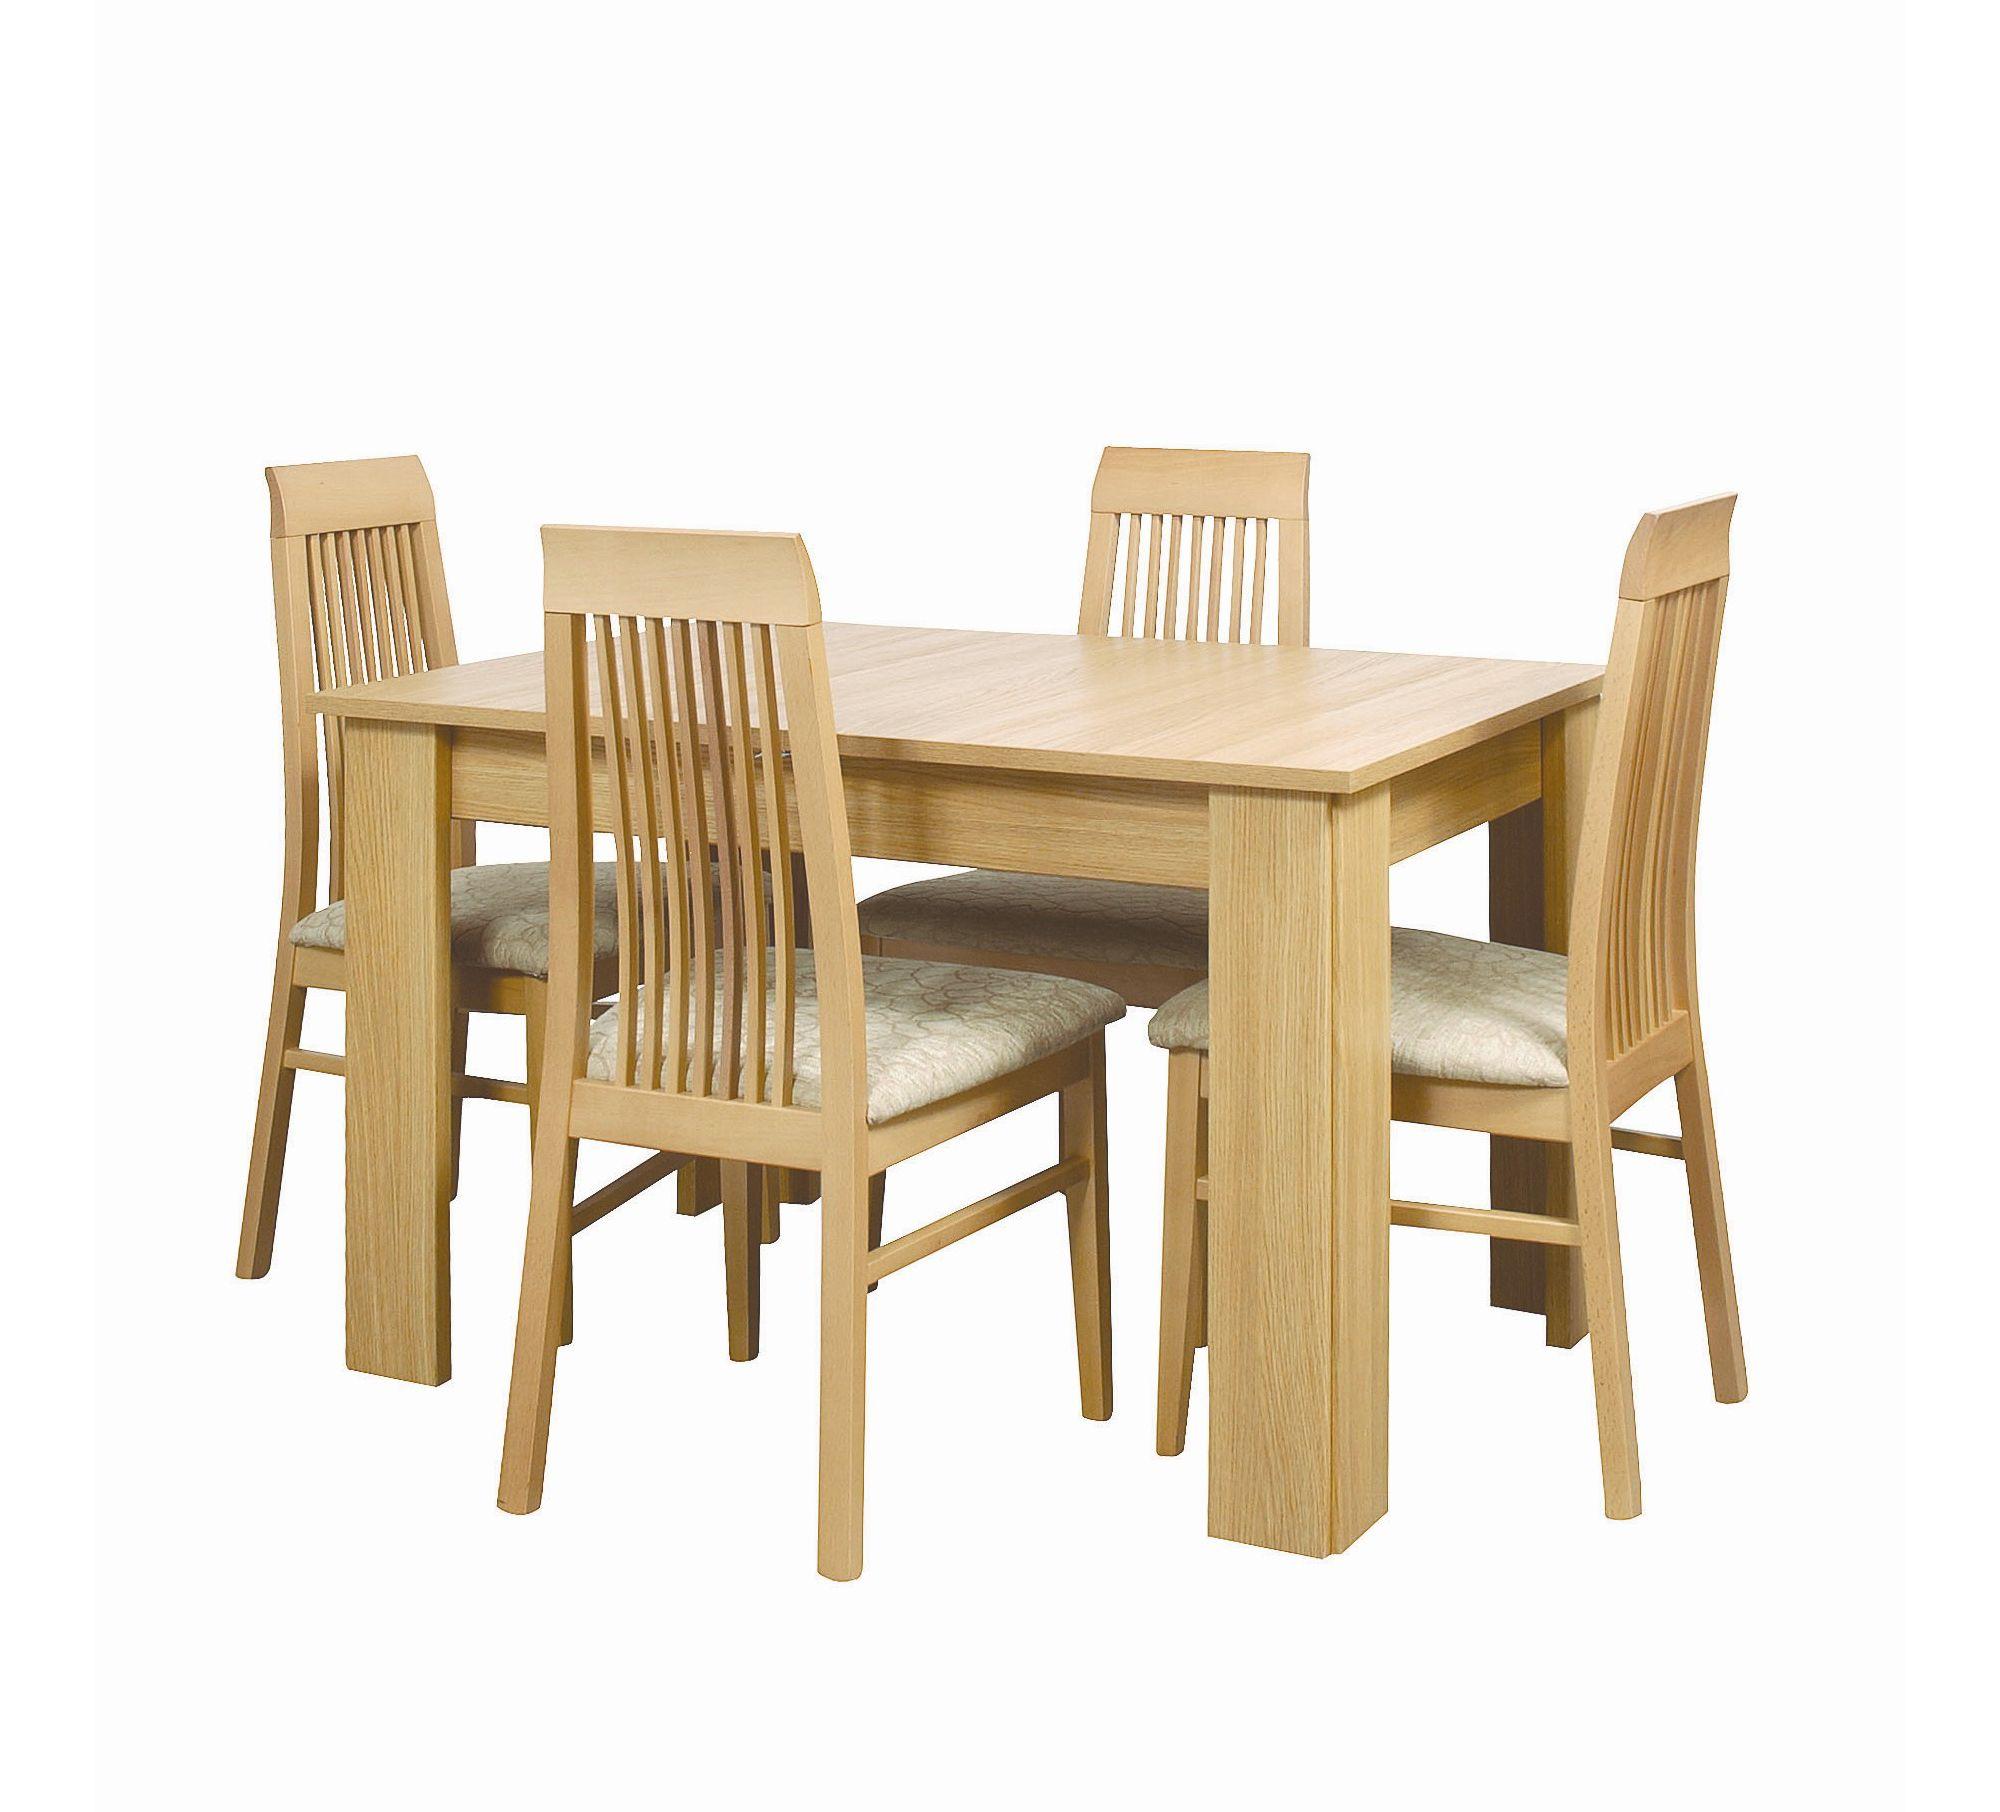 Extending Table 187 Tesco Extending Tables : 658 5831PI1000015MNwid2000amphei2000 from extendingtable.co.uk size 2000 x 2000 jpeg 215kB